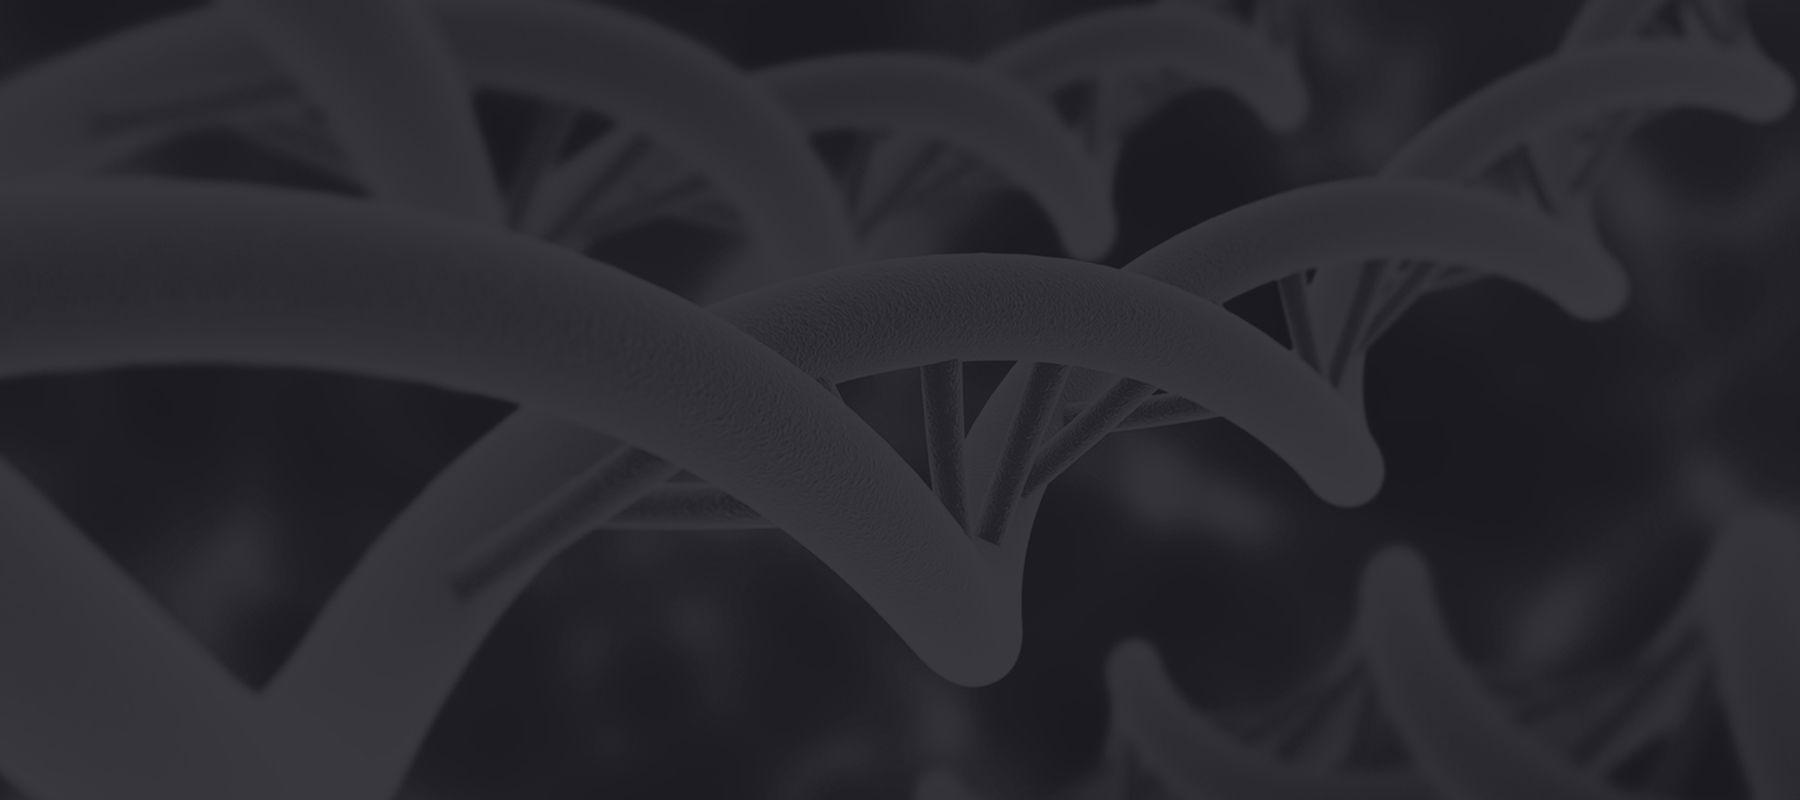 The Future of Genomics Research DNA Editing - Innovative Genomics Initiative (IGI)